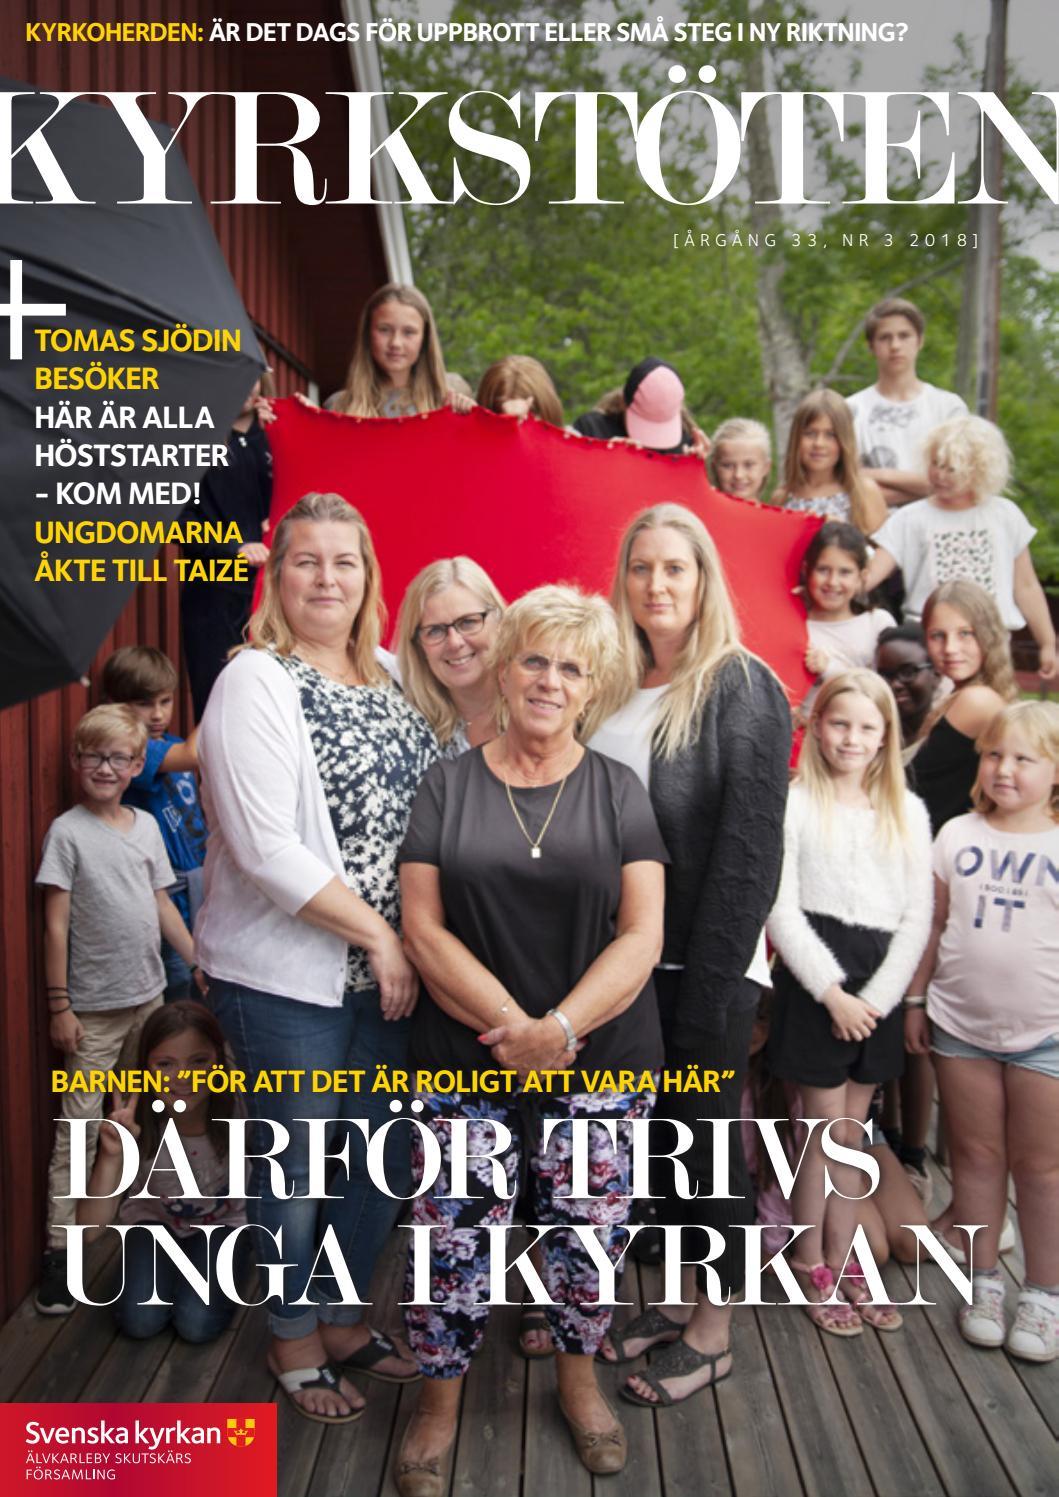 Diakoni - lvkarleby-Skutskrs frsamling - Svenska kyrkan